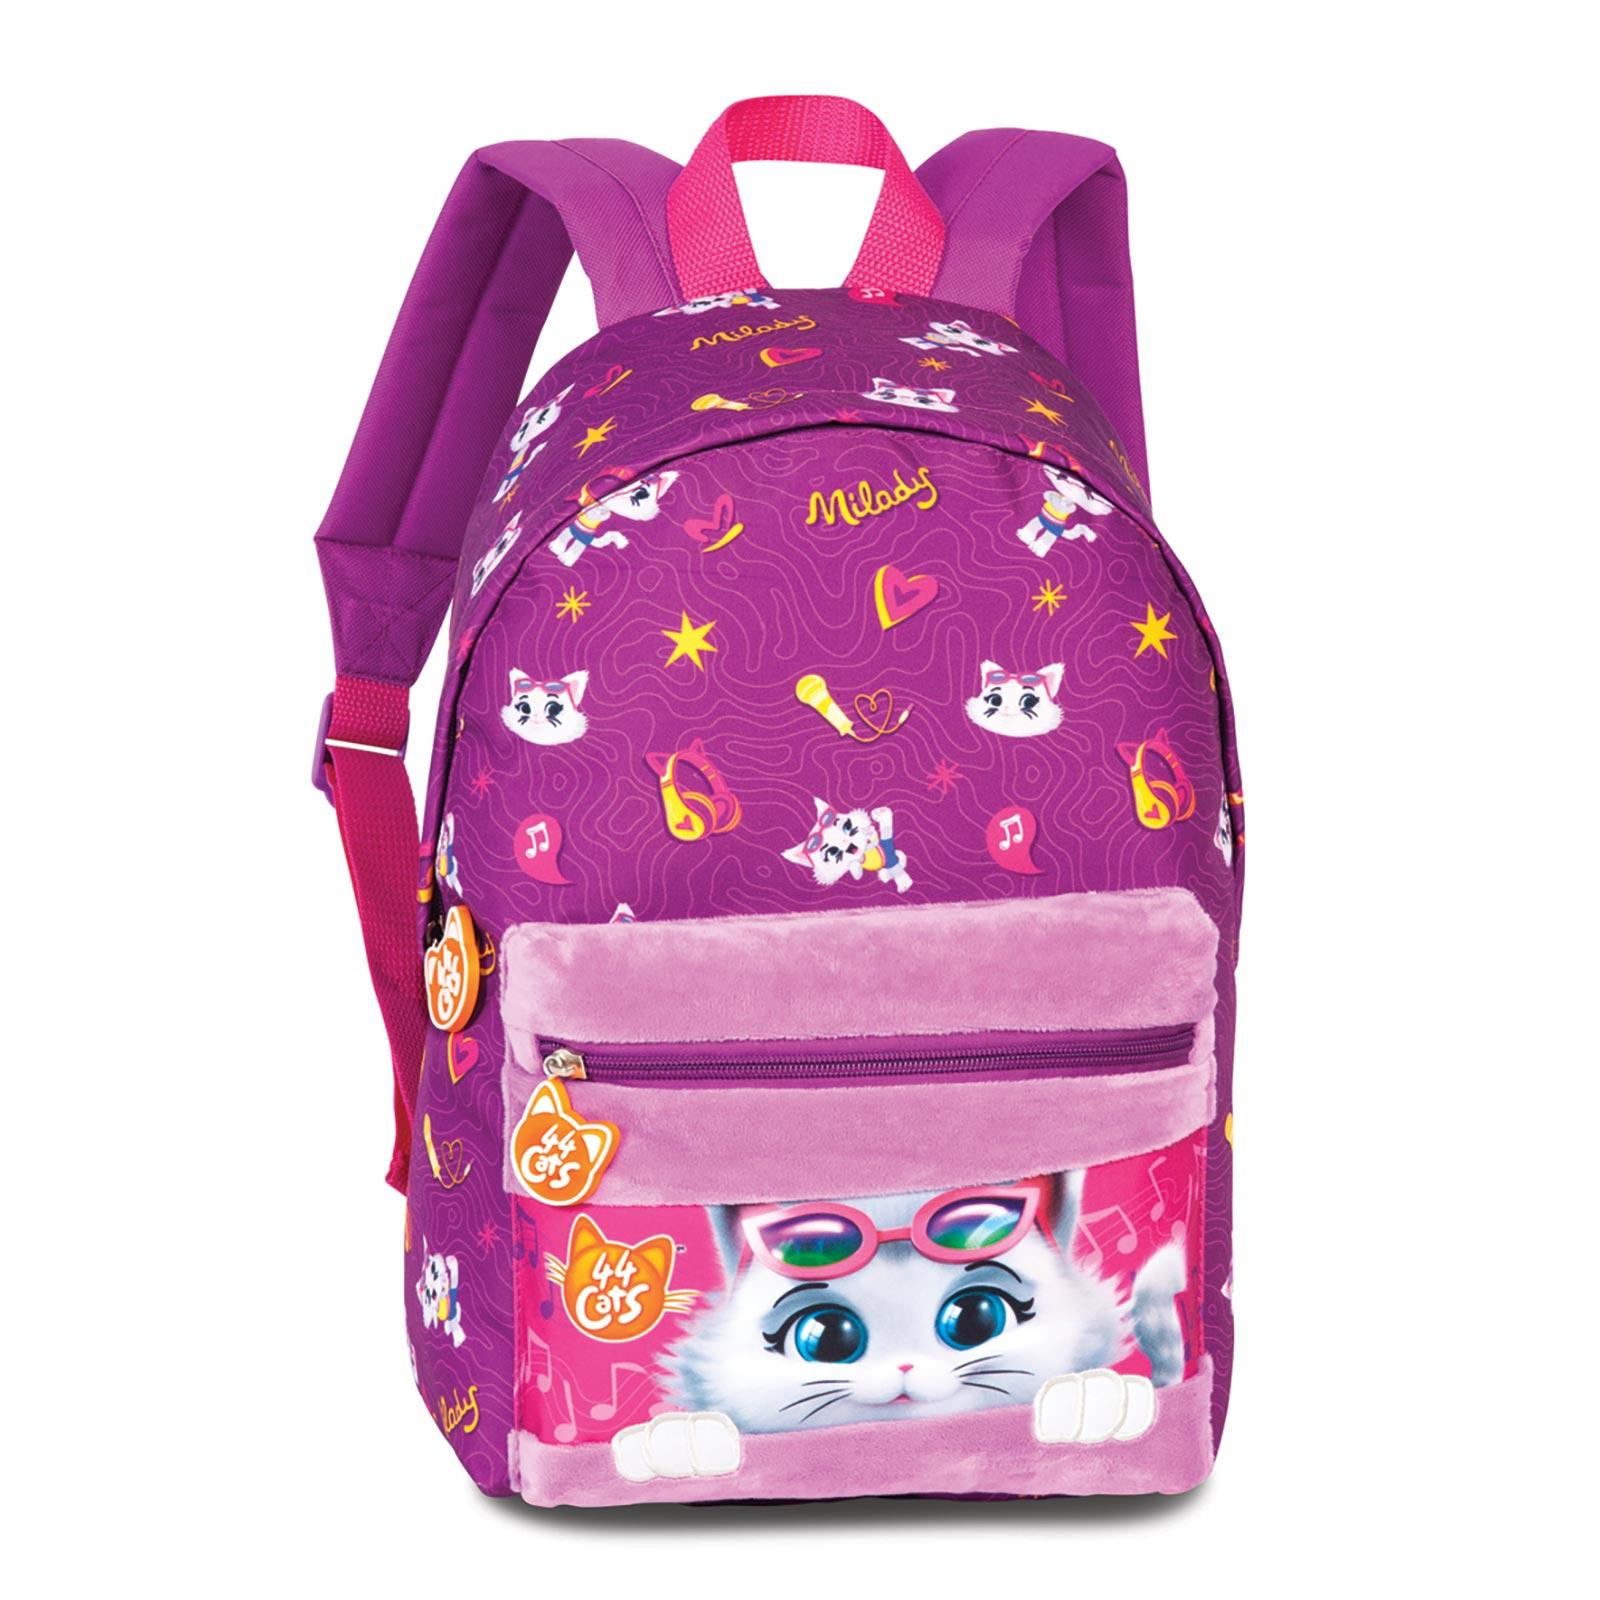 Fabrizio Kids 44 Cats Rucksack 36 cm - Pink 20629-3100